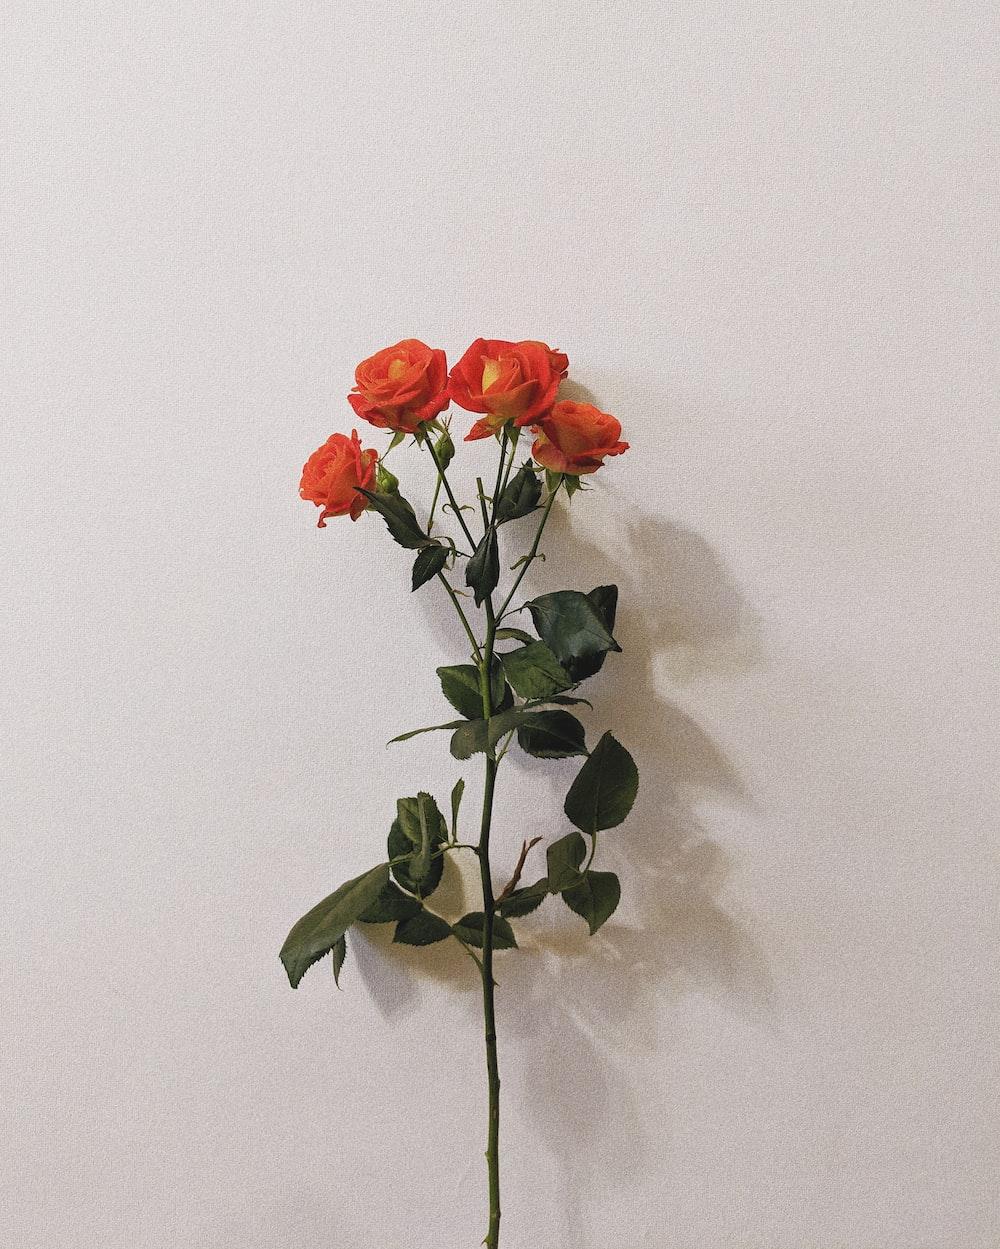 four orange-petaled flowers